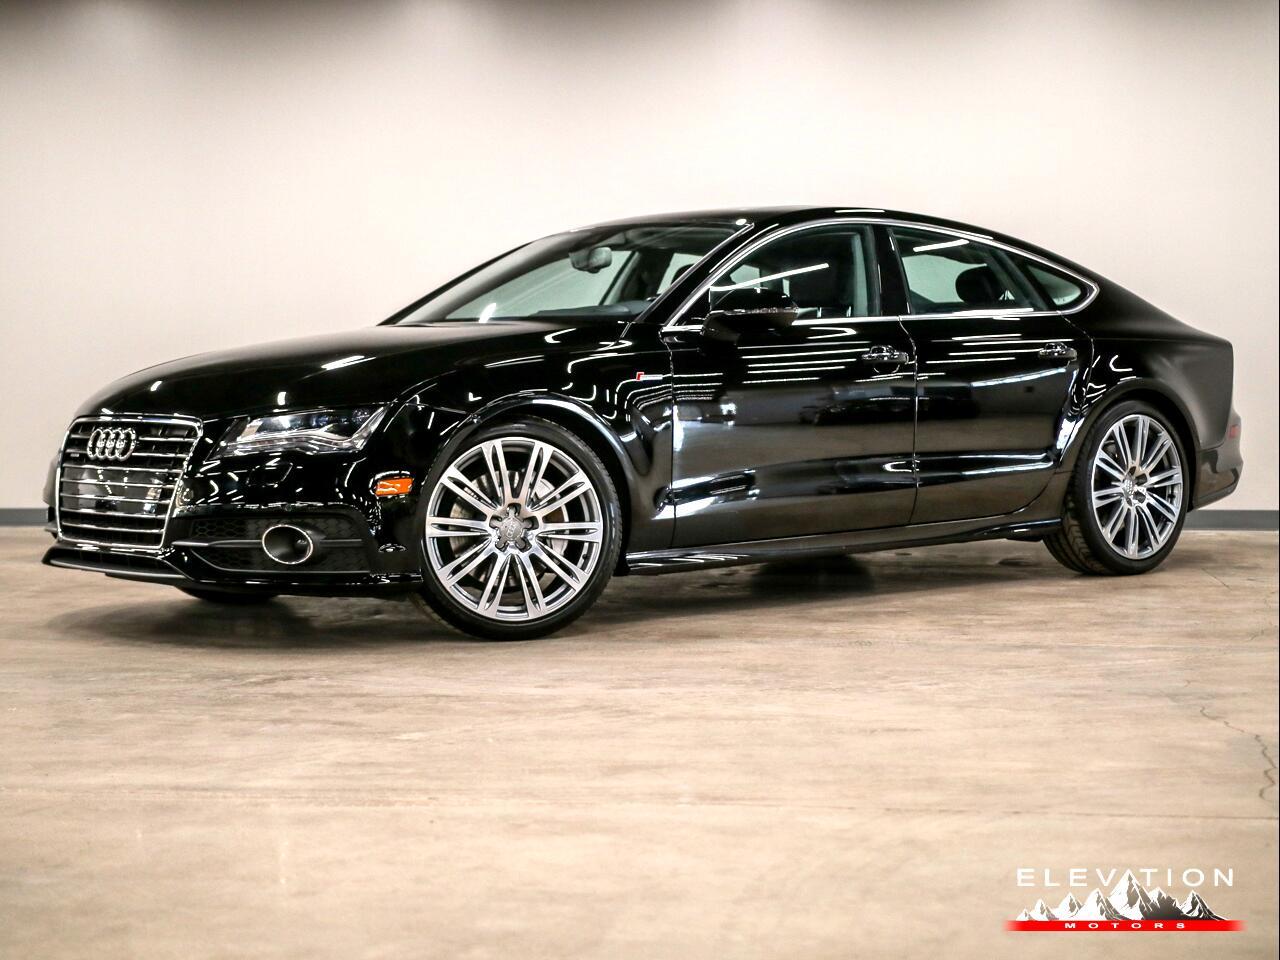 2012 Audi A7 3.0 TFSI Prestige quattro